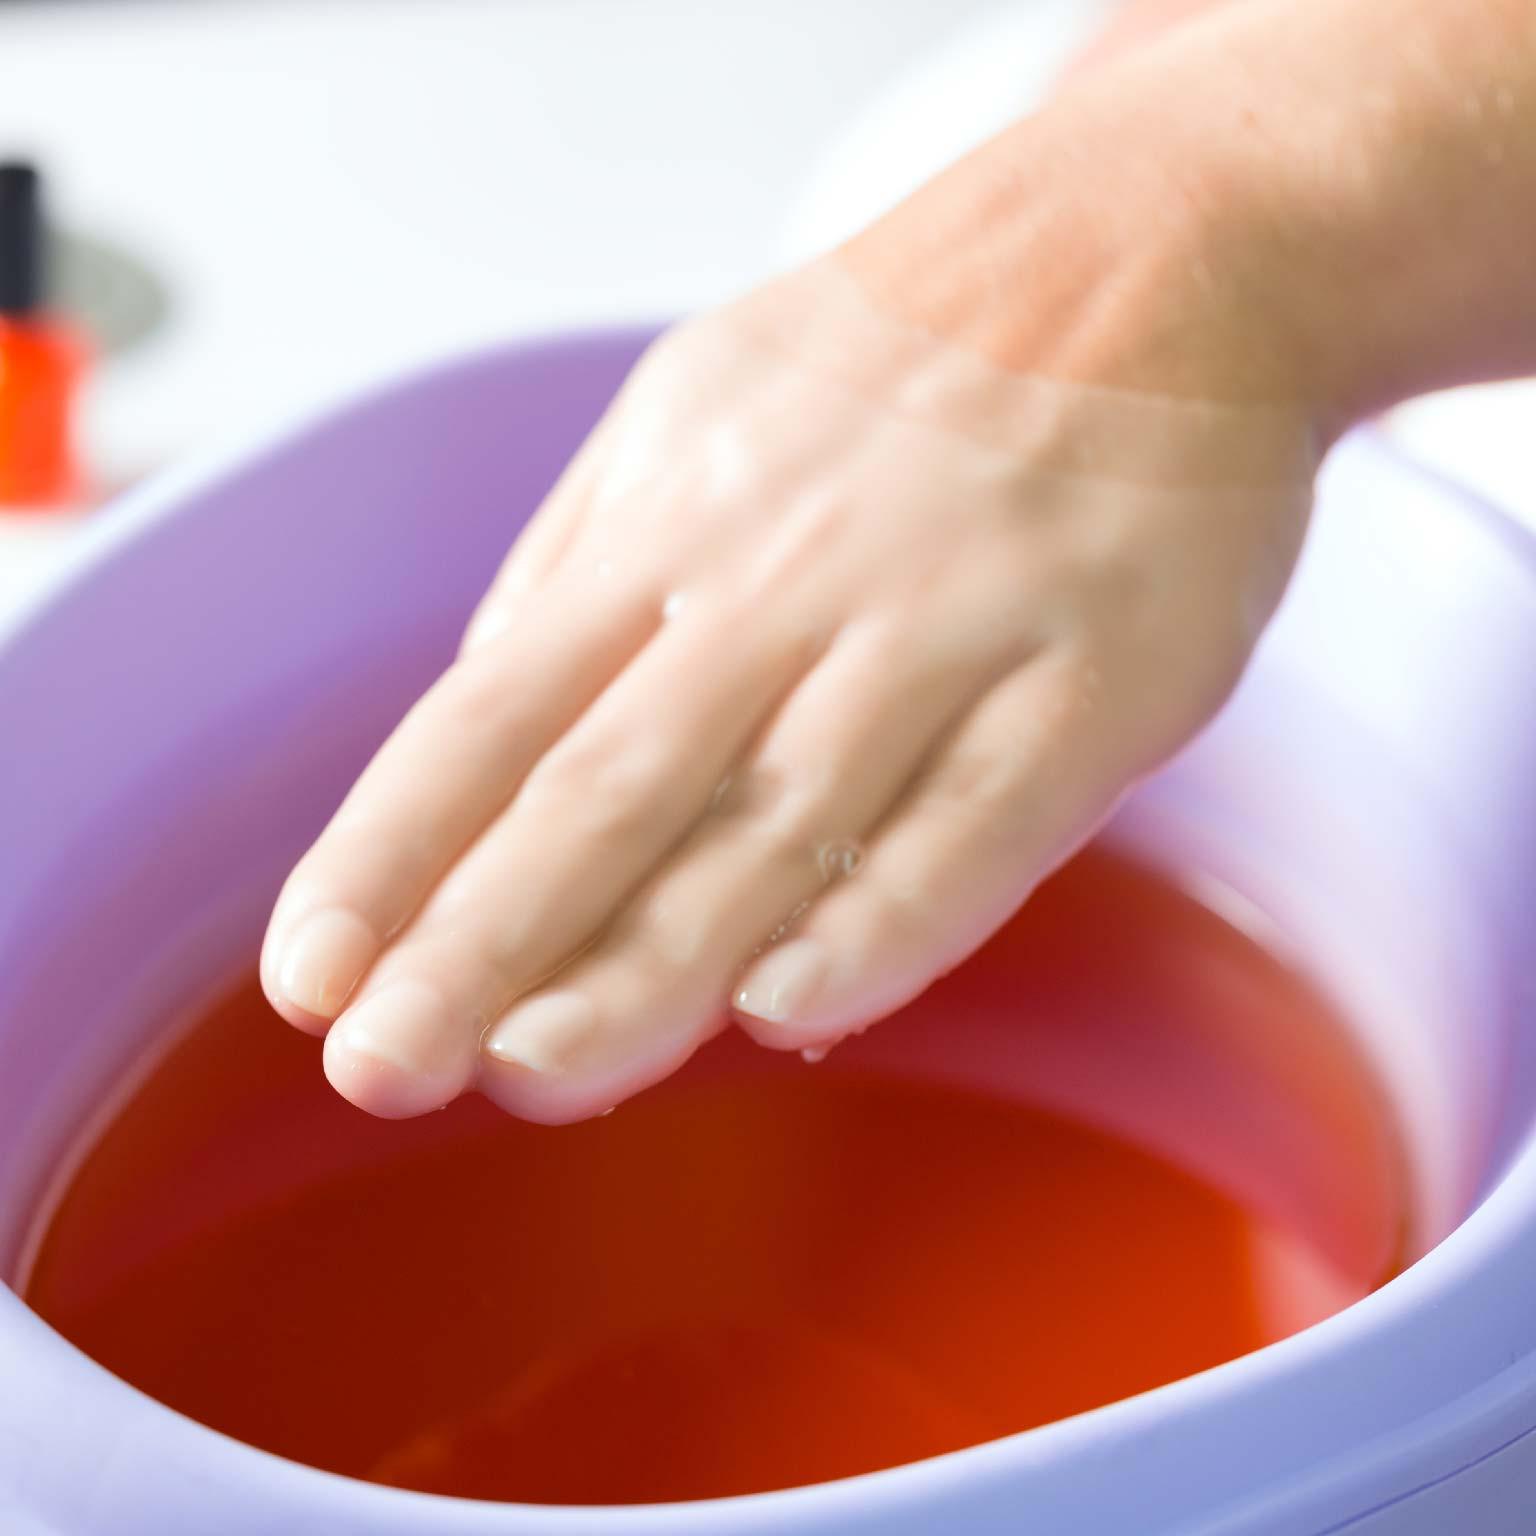 Paraffin Treatment Hands